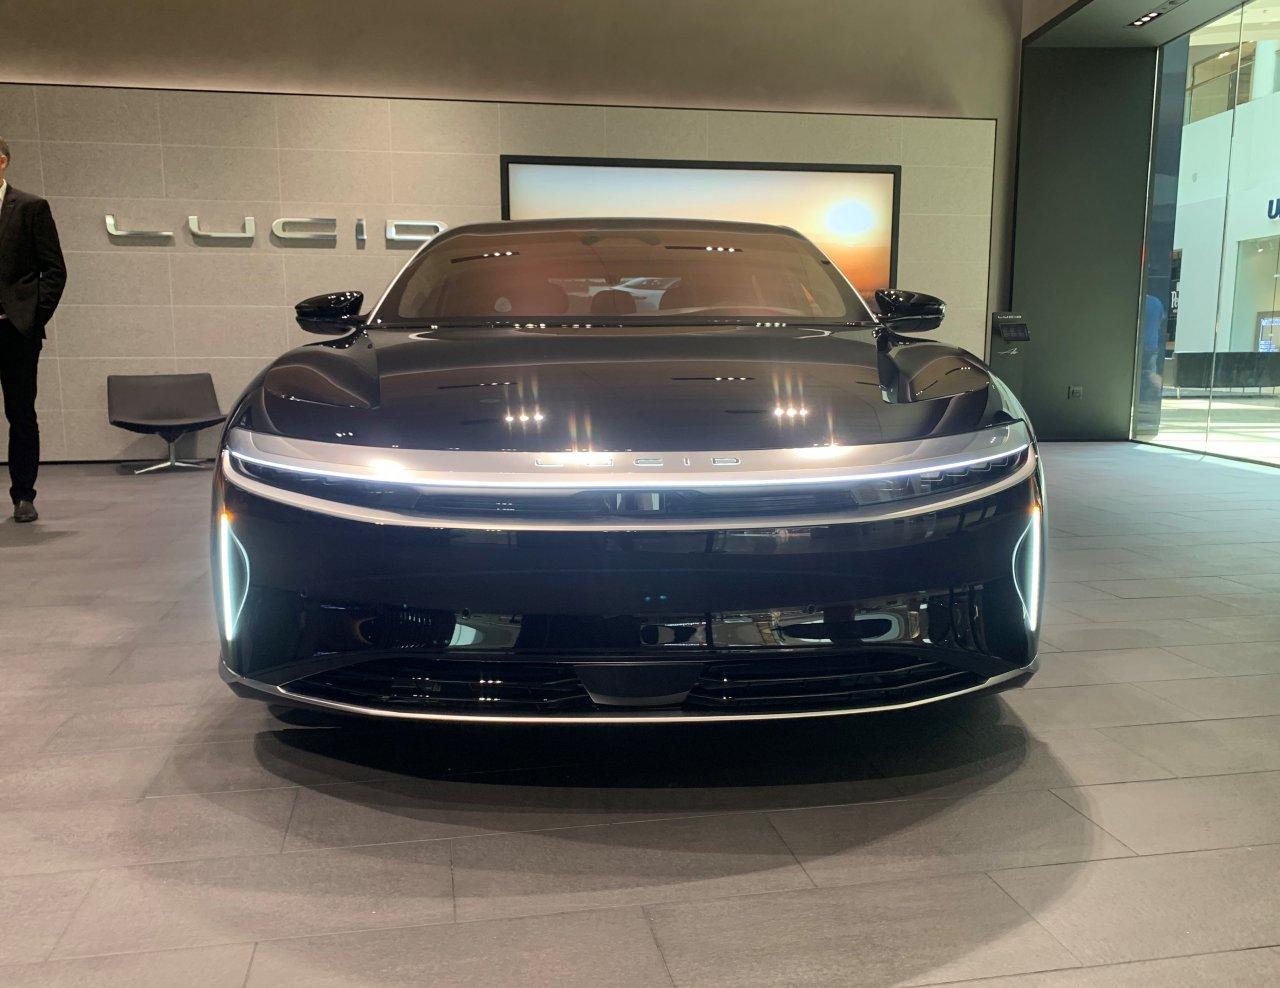 Lucid, We visit a Lucid Motors electric-vehicle showroom, ClassicCars.com Journal